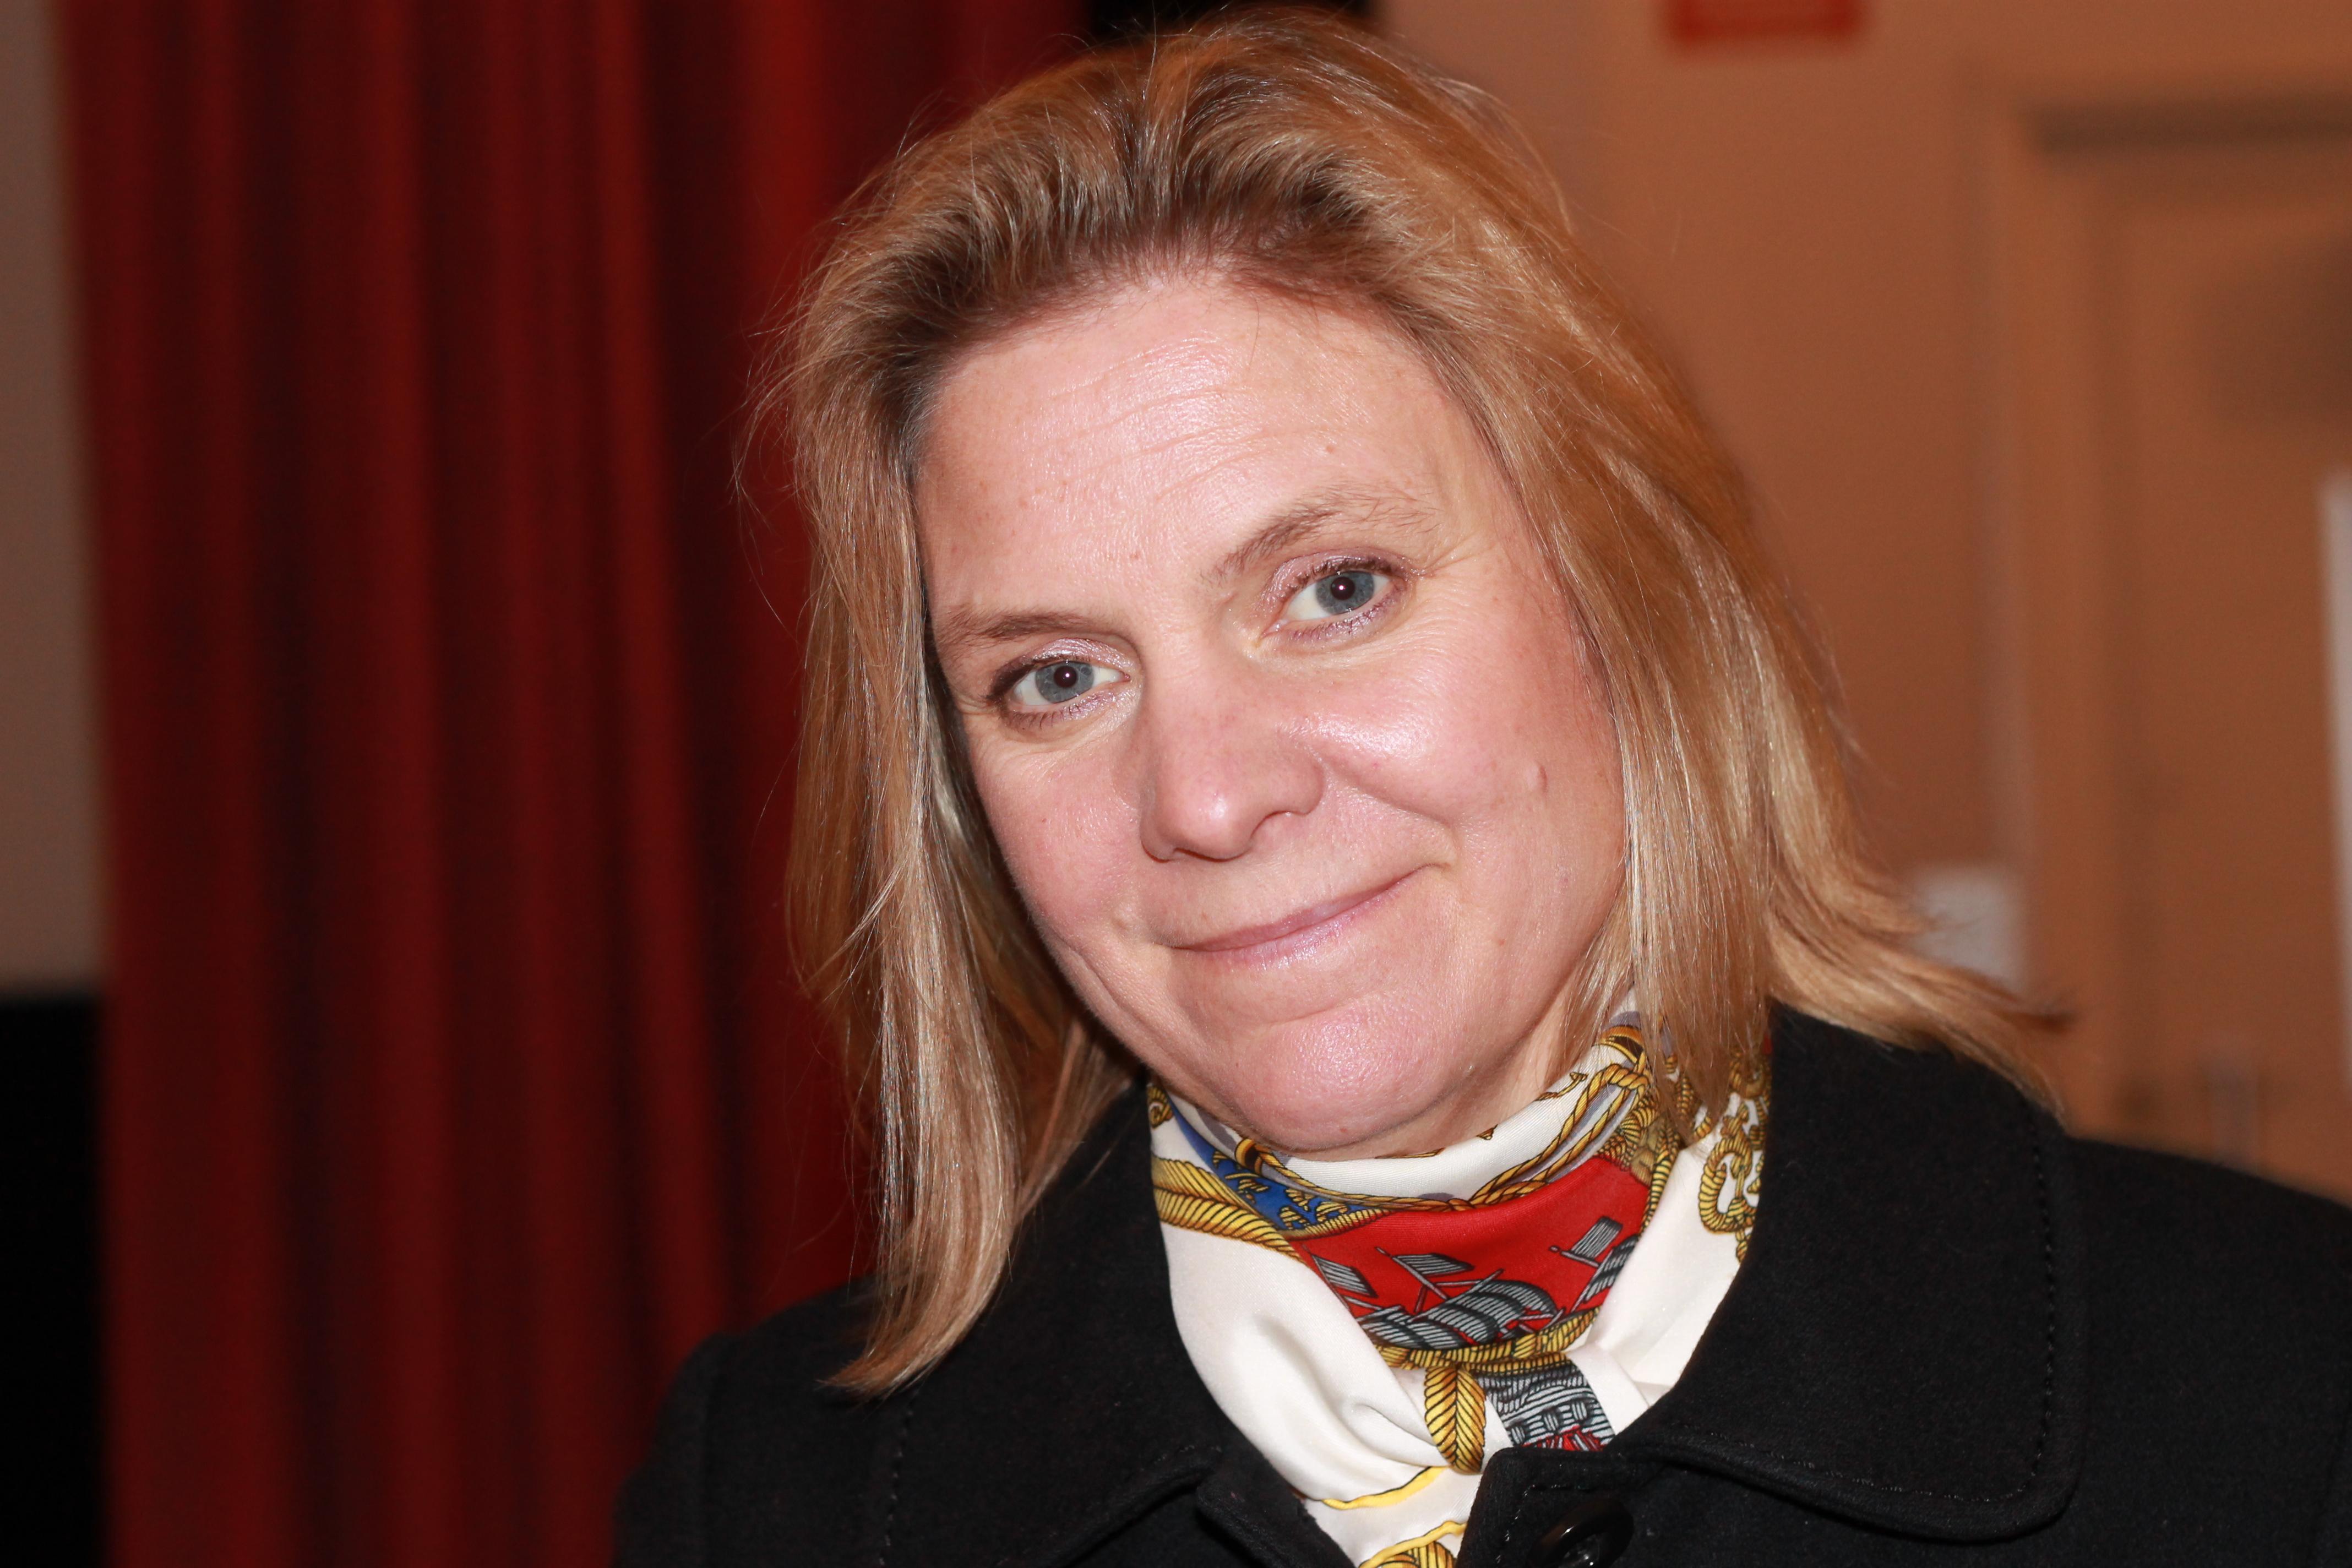 Filemagdalena Andersson Jpg